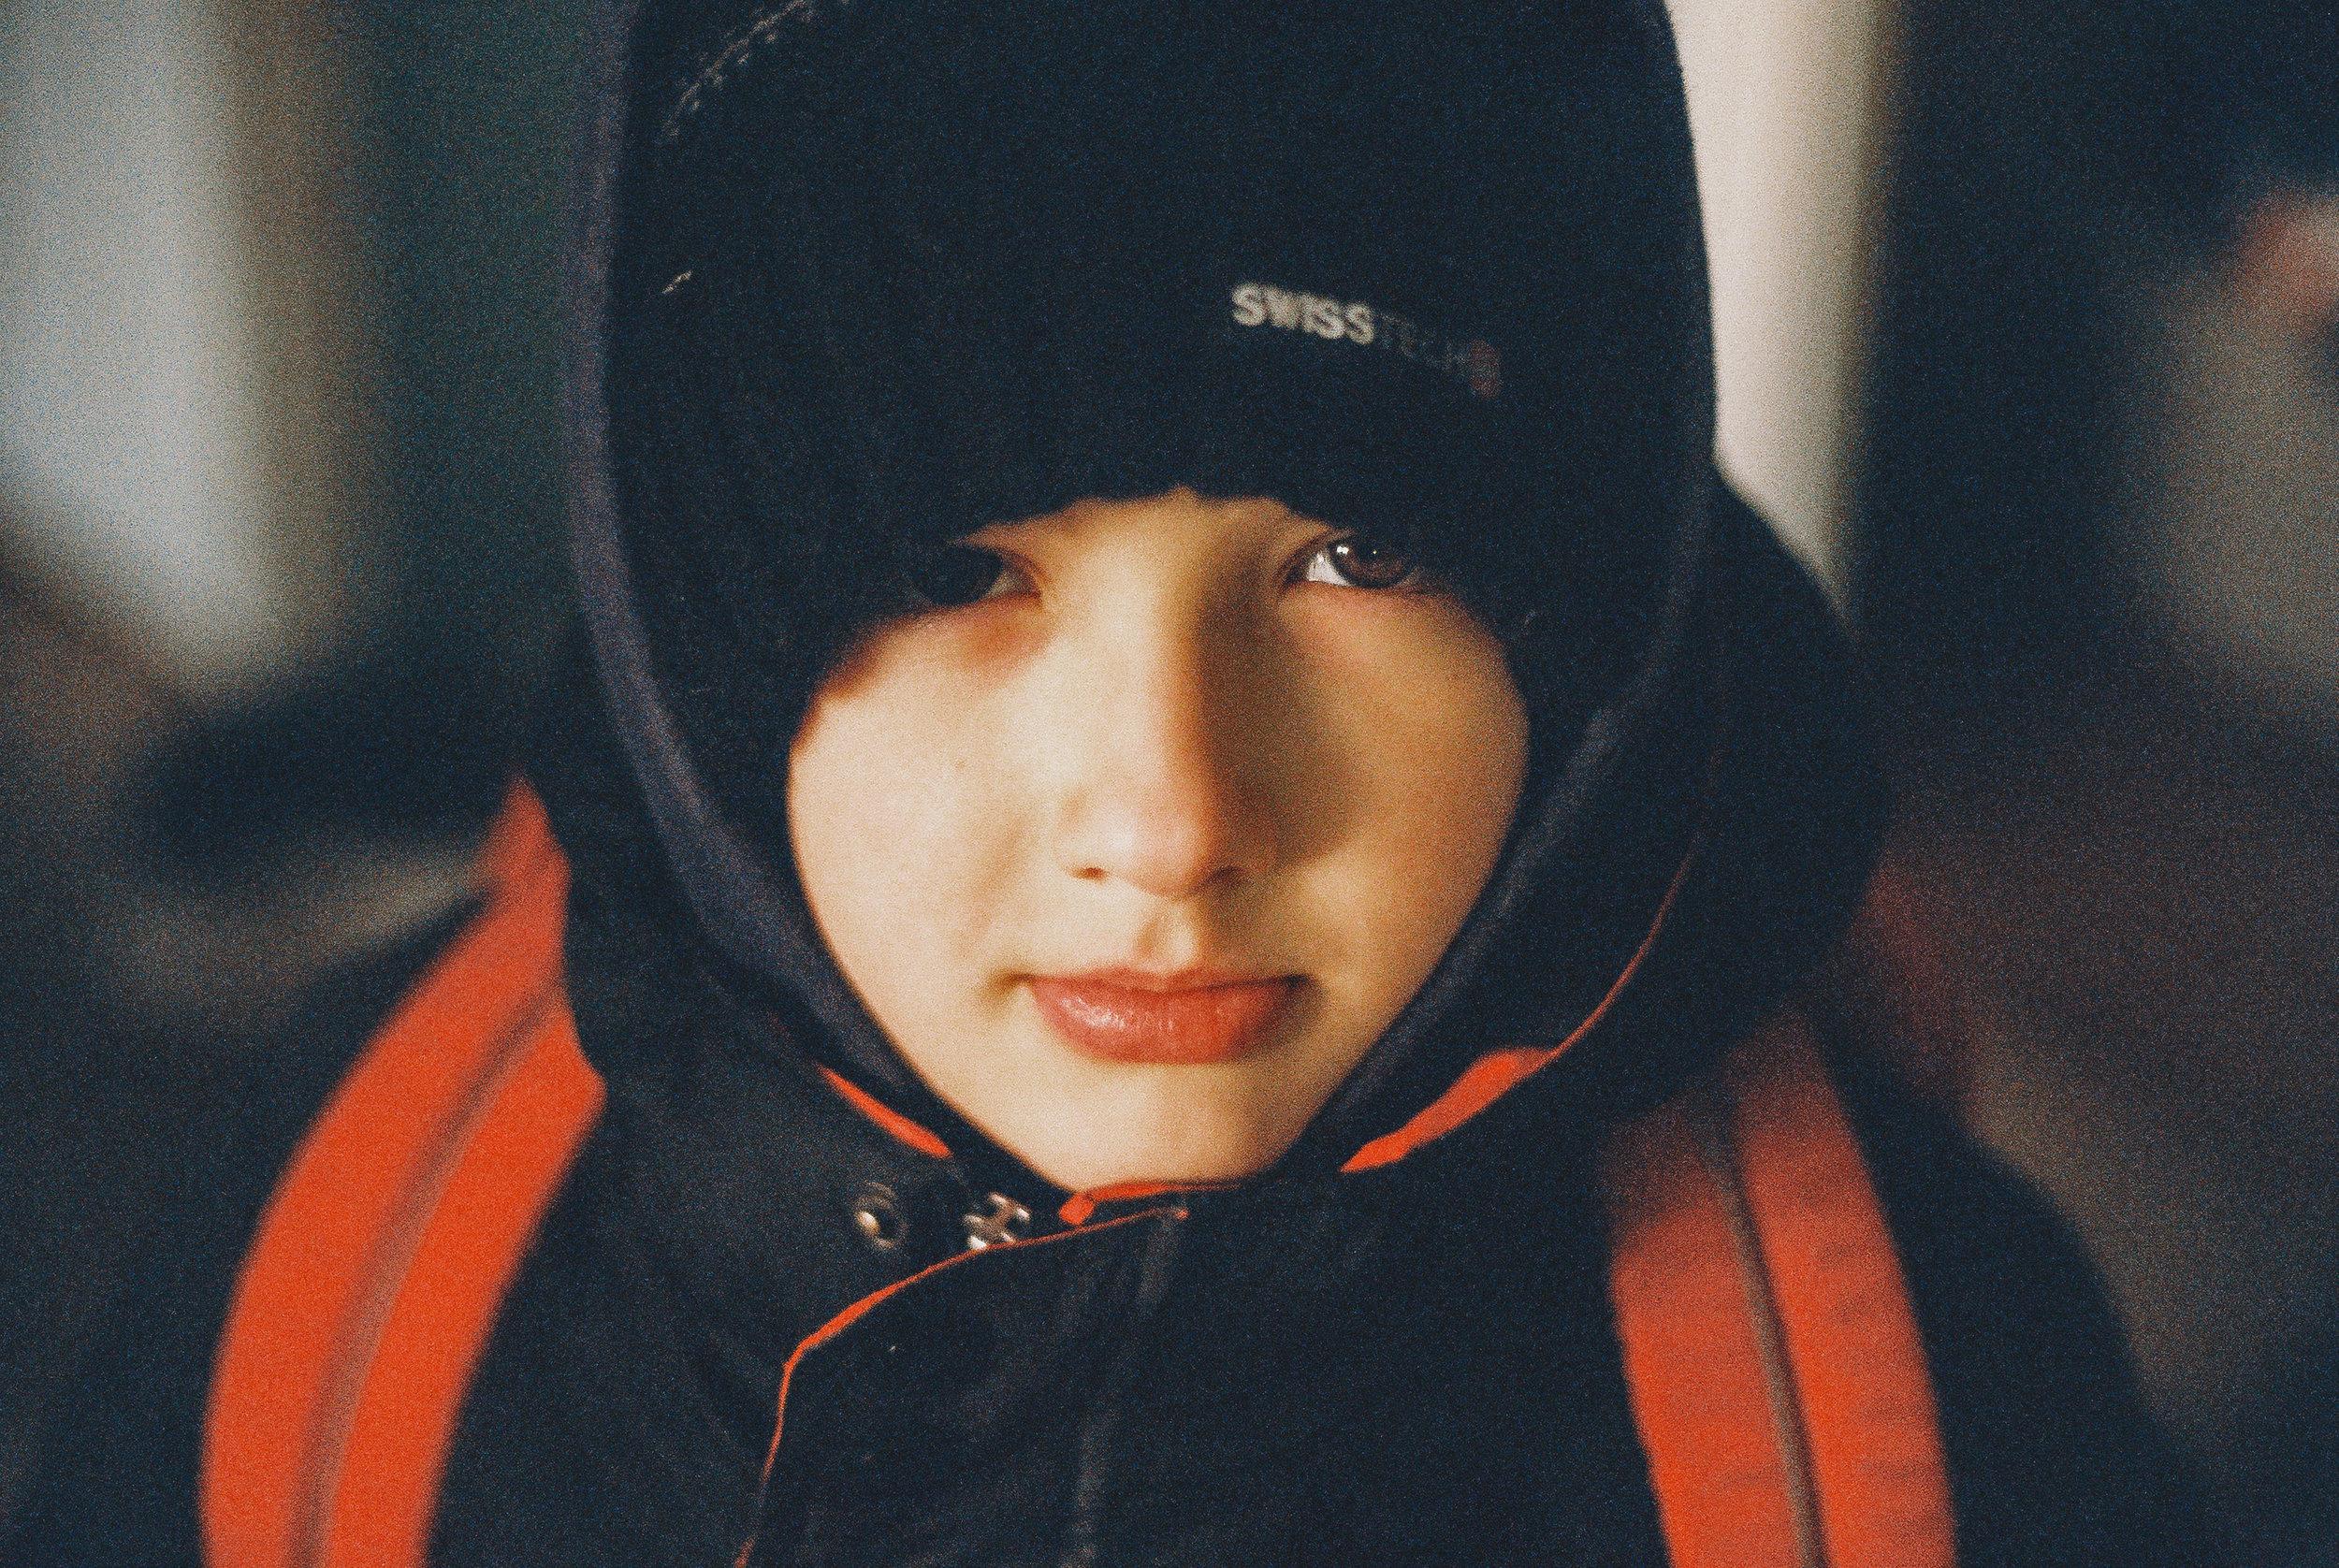 Boy in snow jacket